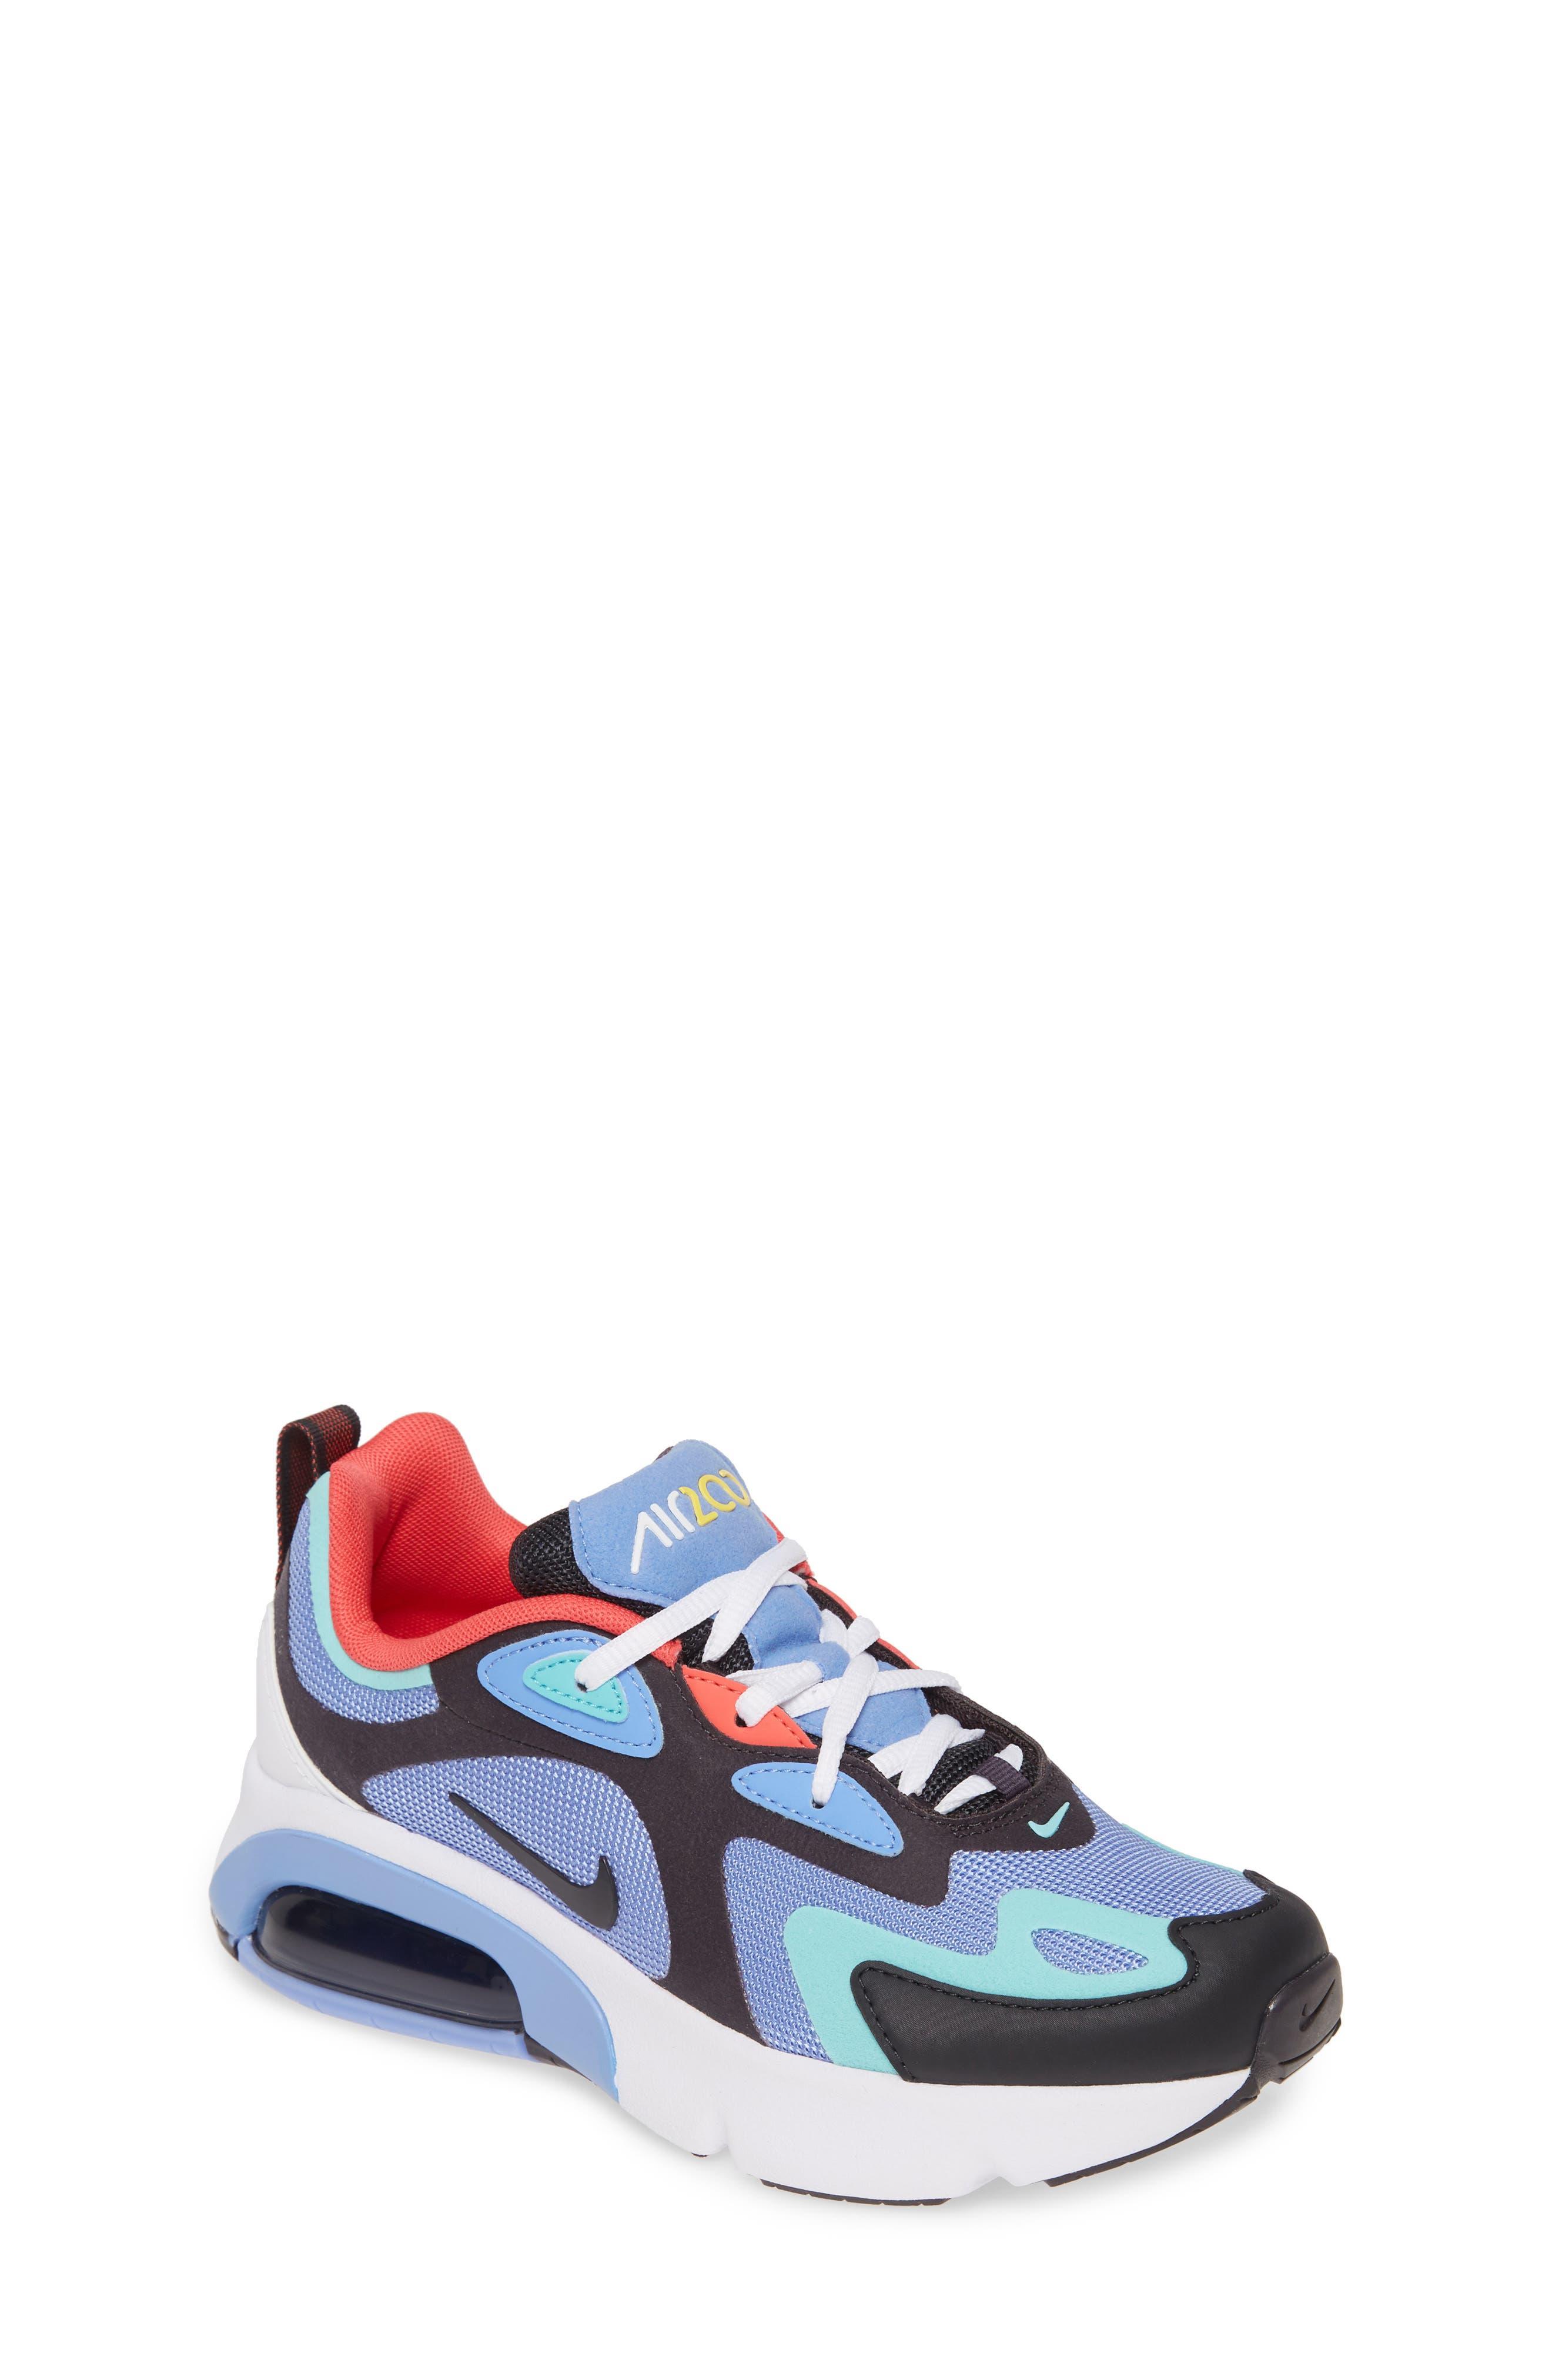 Infant Boys Nike Air Max 200 Sneaker Td Size 4 M  Blue